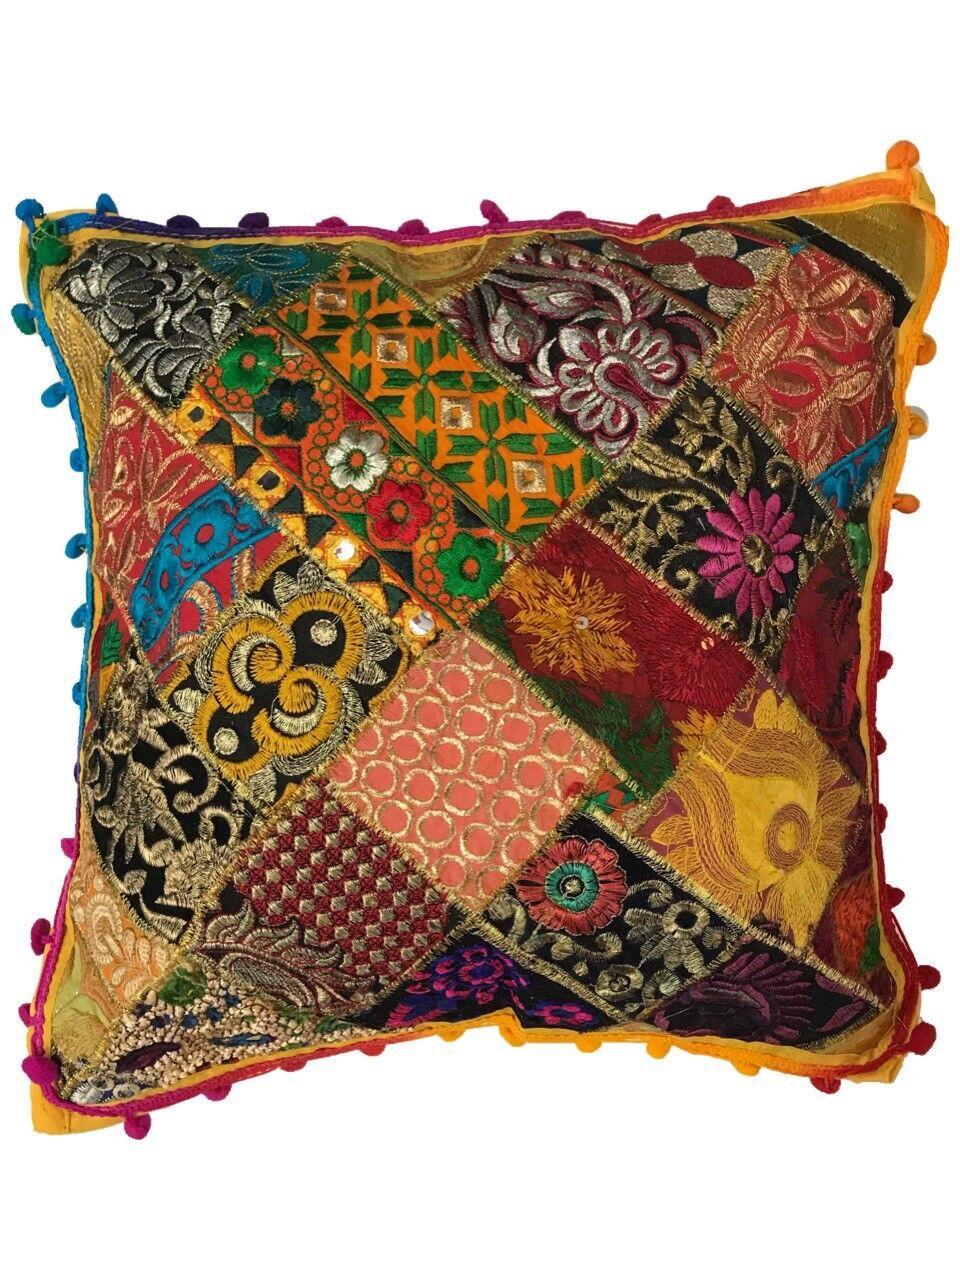 Cuscini Indiani Vendita On Line.Indiano Patchwork Gujarati Mandala Sari Etnico Federe Per Cuscini